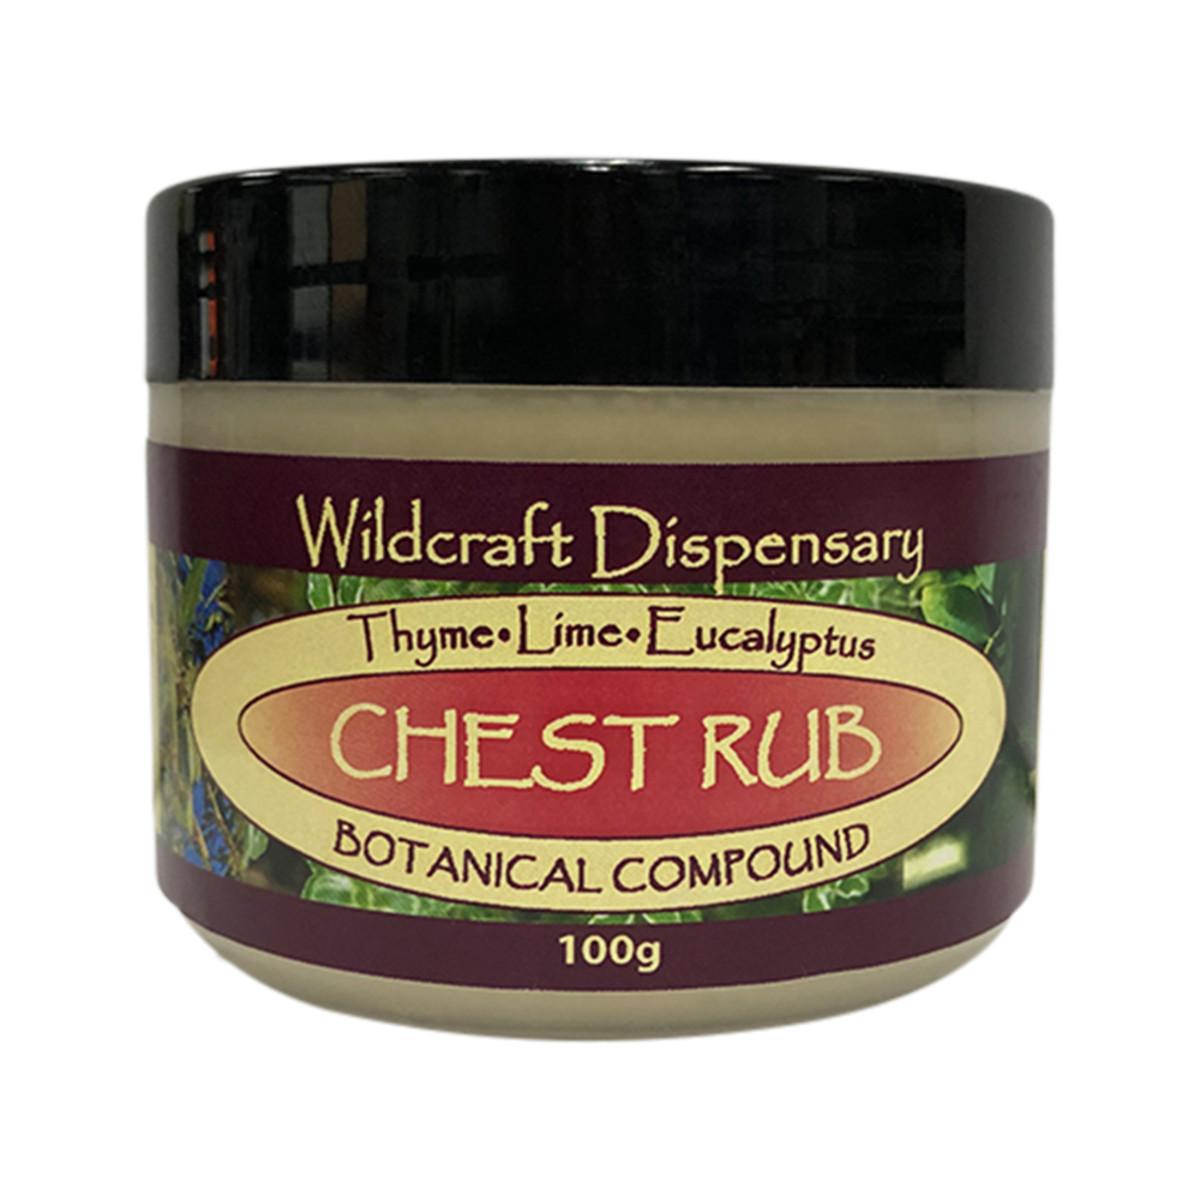 WILDCRAFT DISPENSARY CHEST RUB 100G